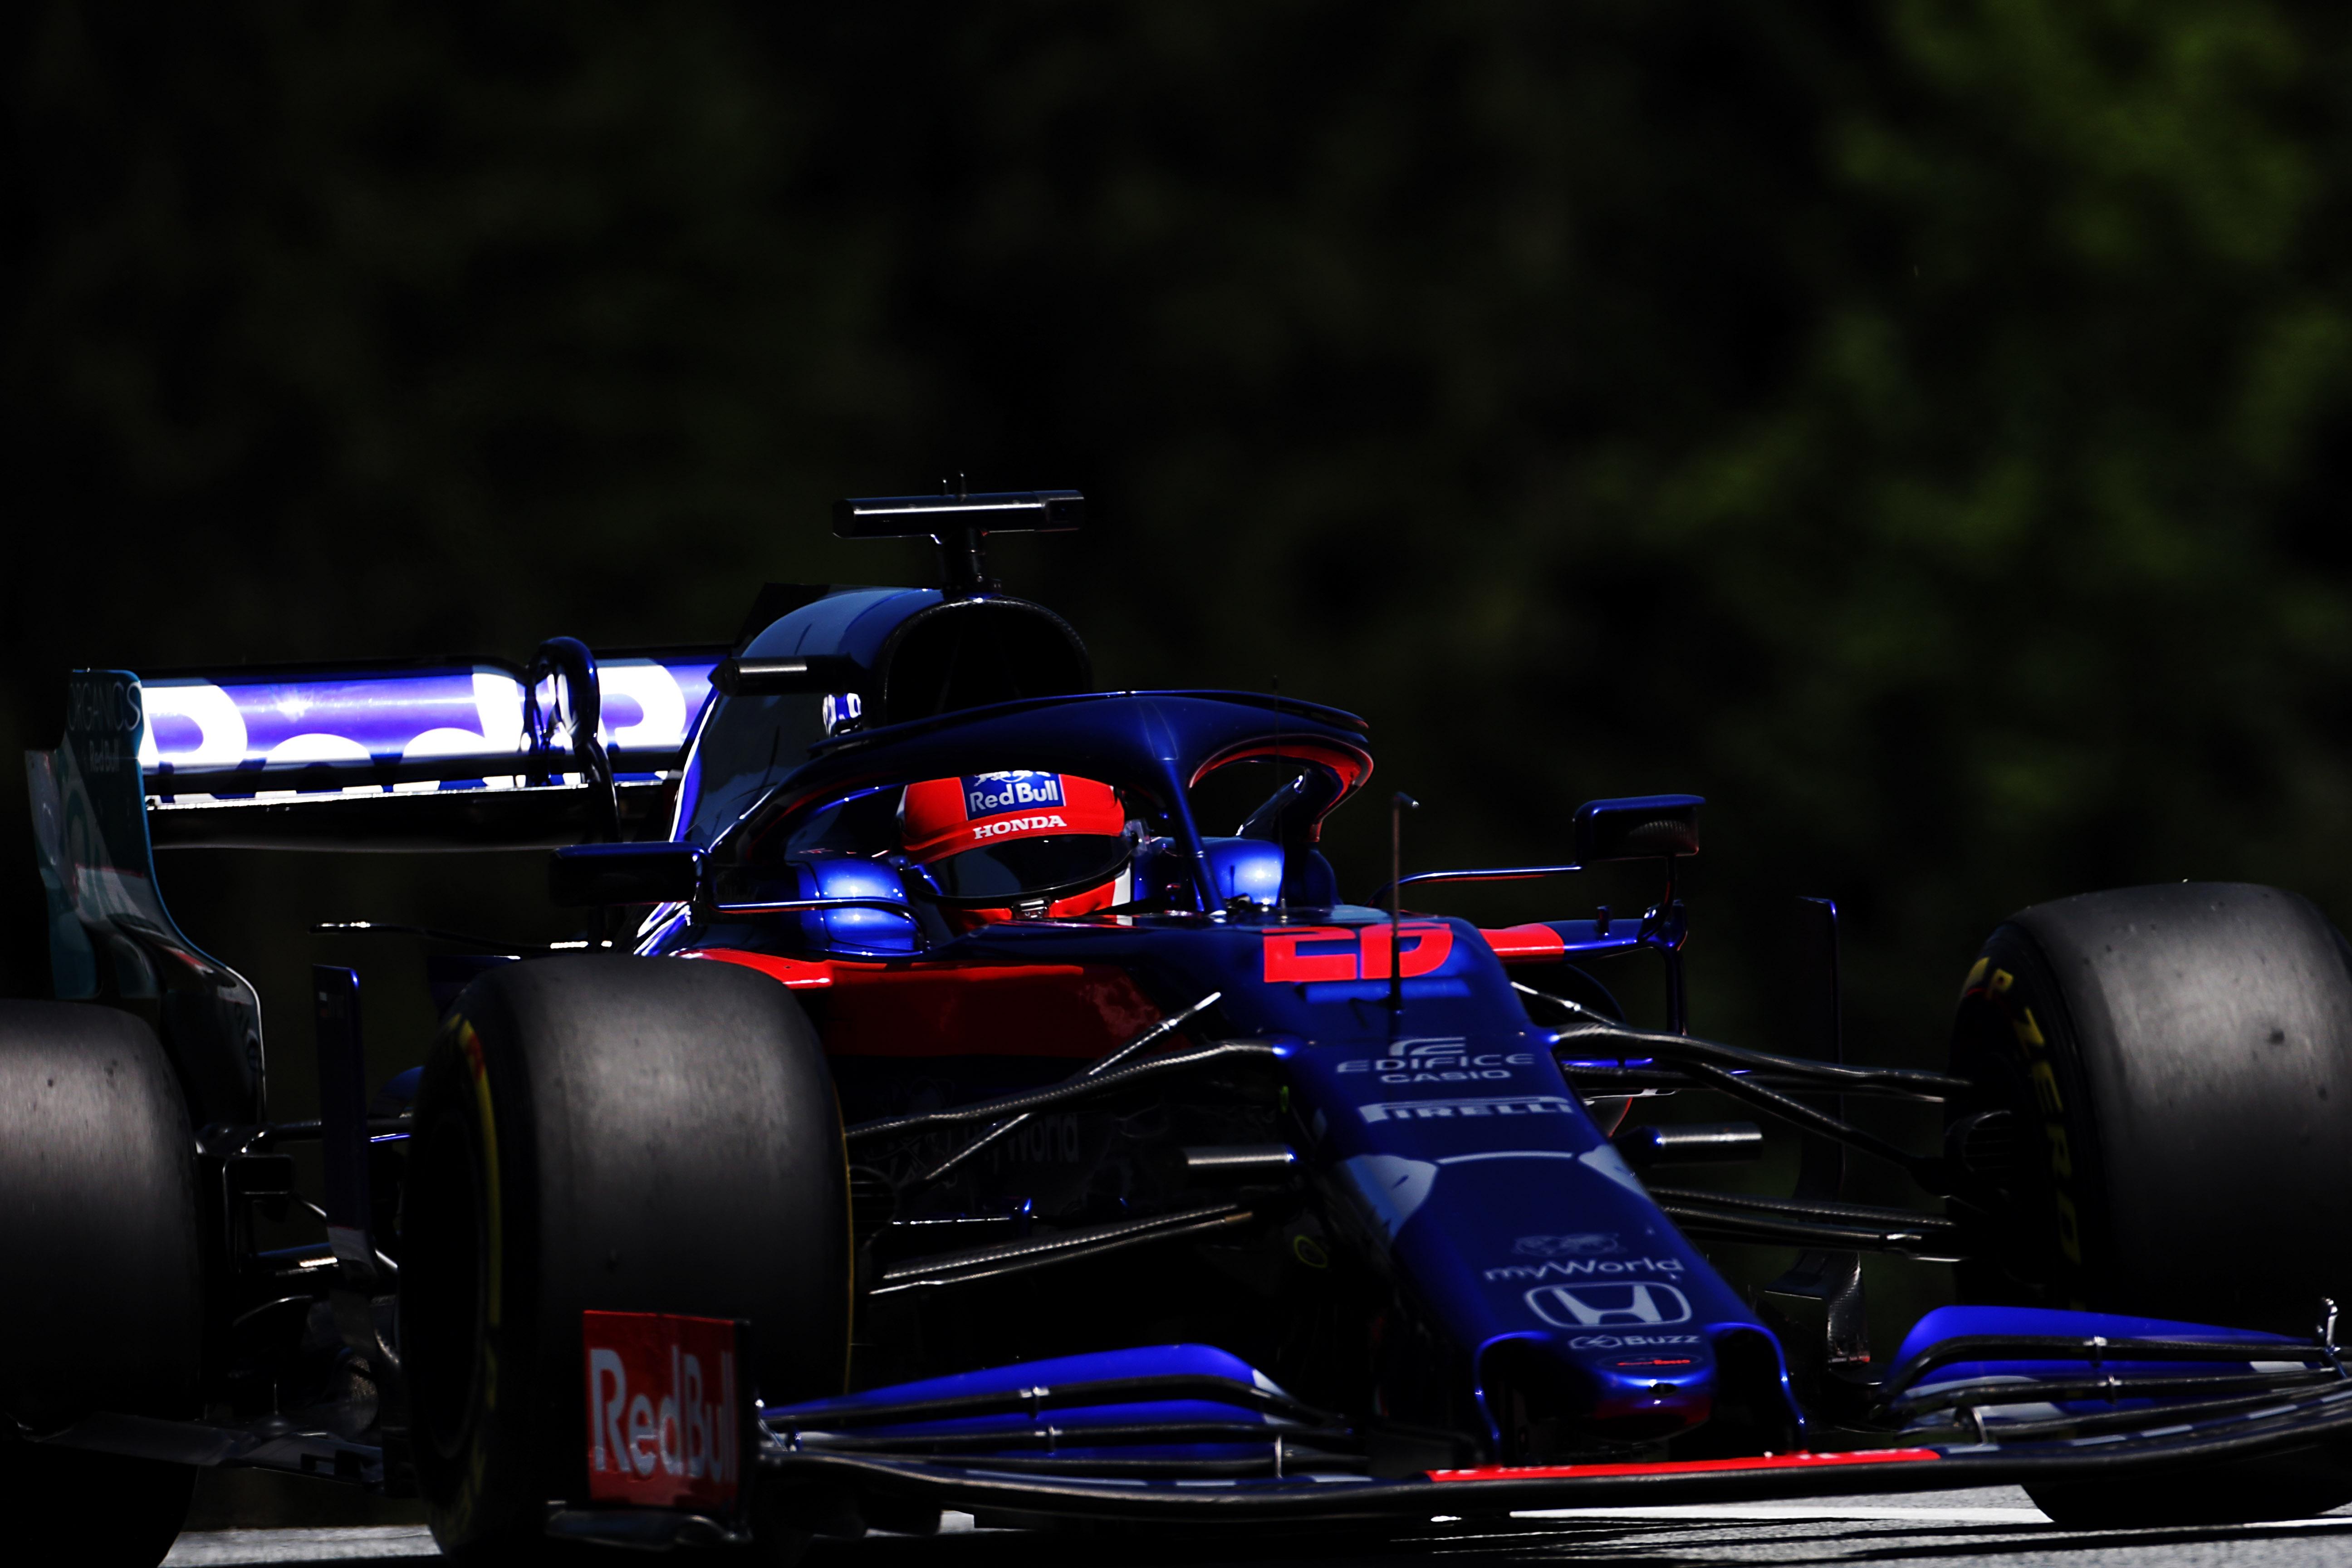 Toro Rosso 2019